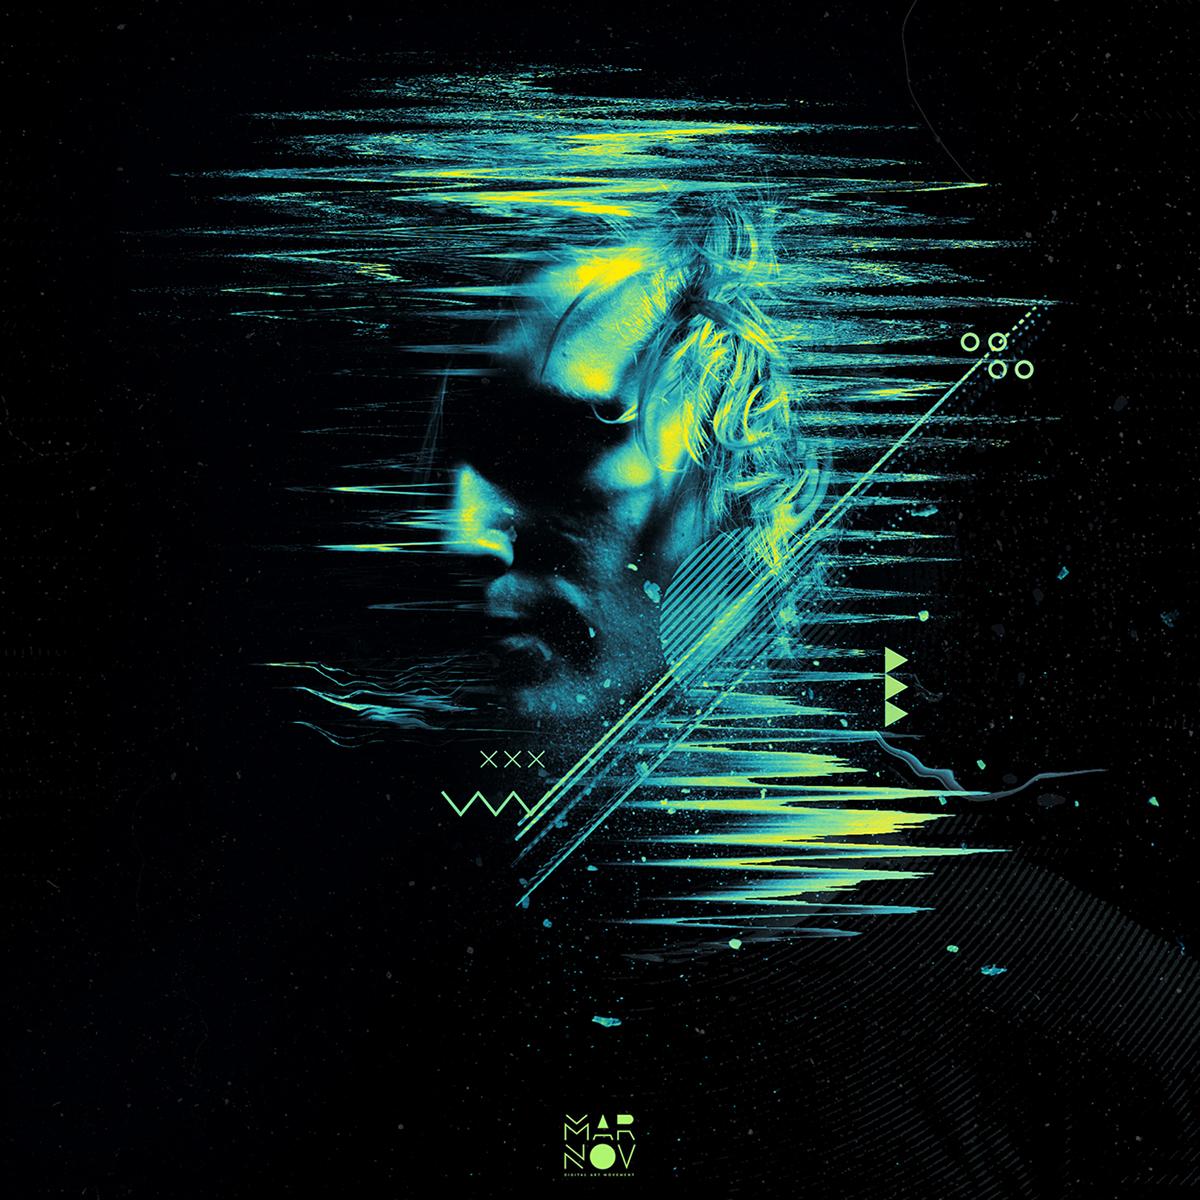 art artwork photoshop Photography  graphic design  Digital Art  abstract glitch art music album art